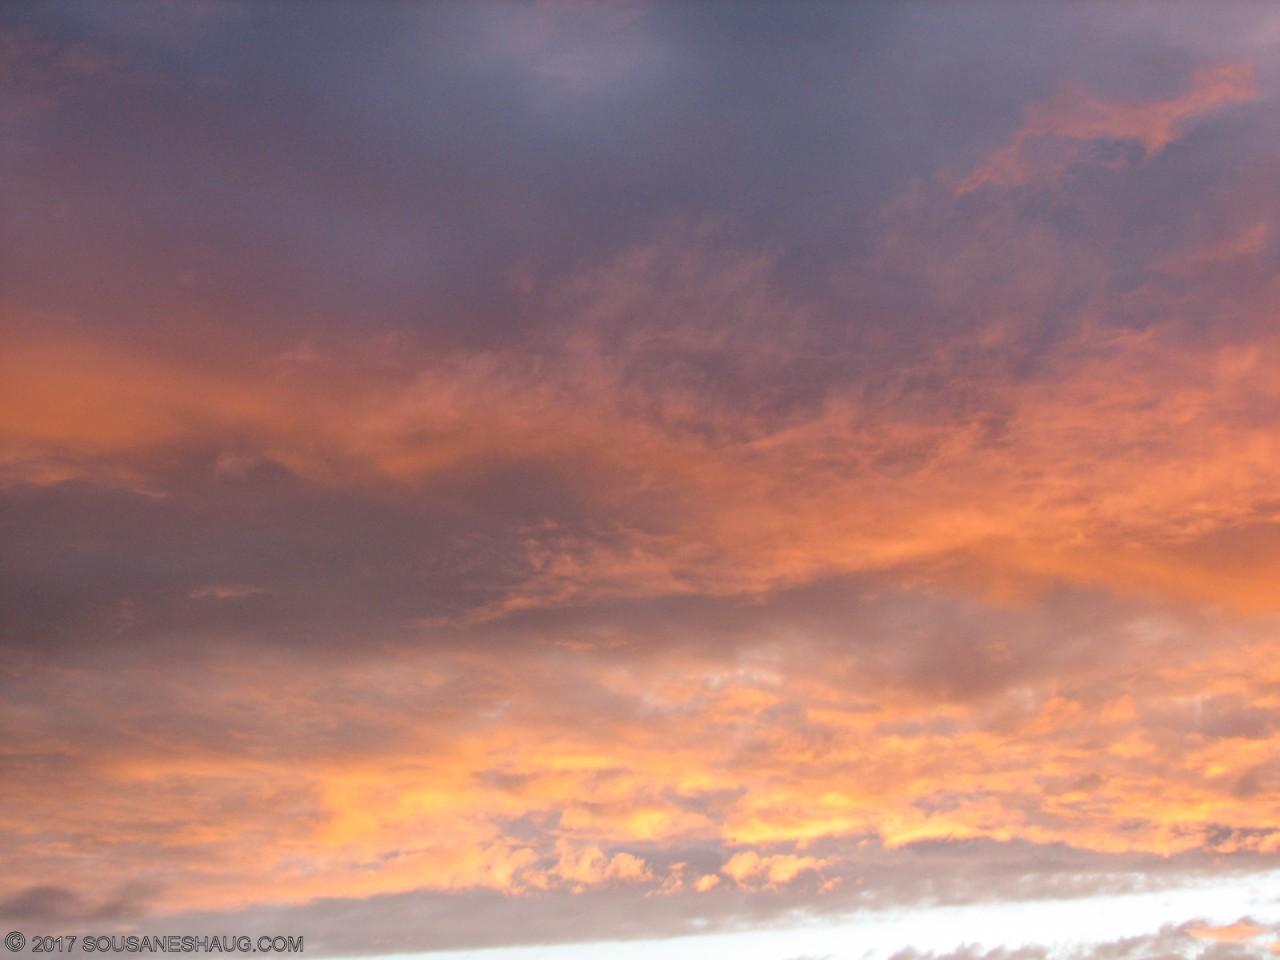 sunset-sky-on-fire-3